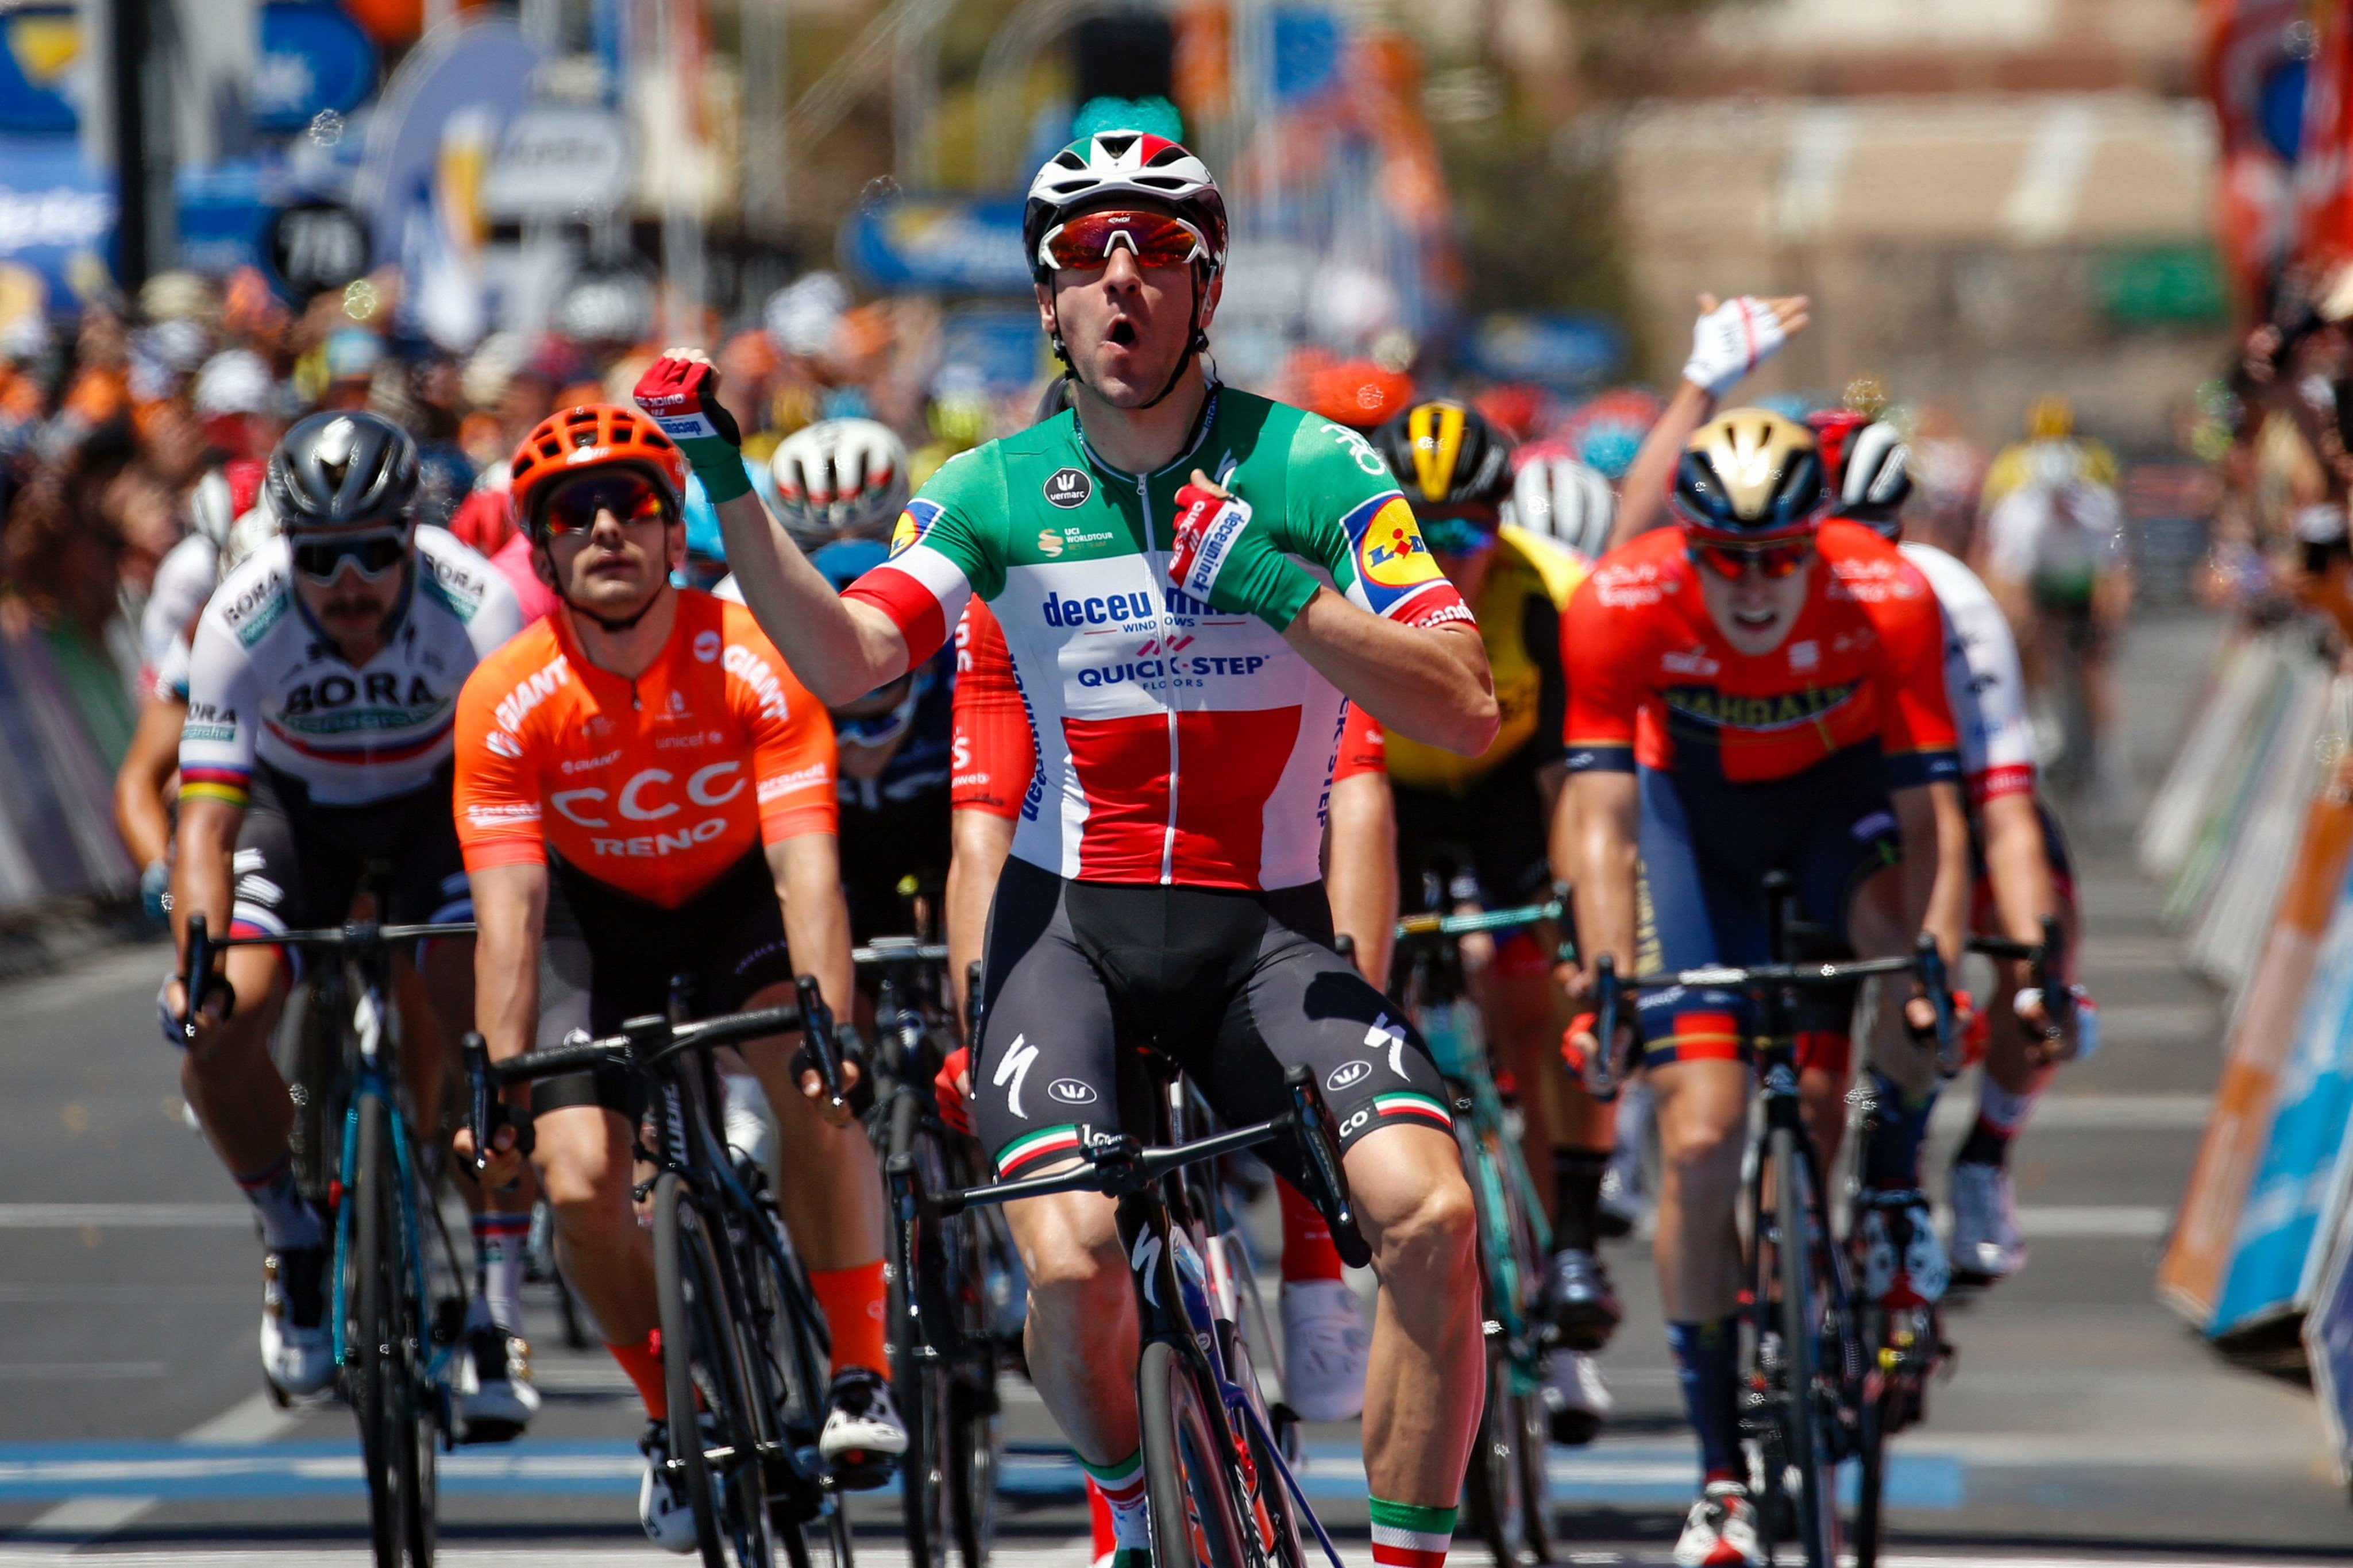 Элиа Вивиани выиграл первый этап велогонки «Тур Даун Андер»